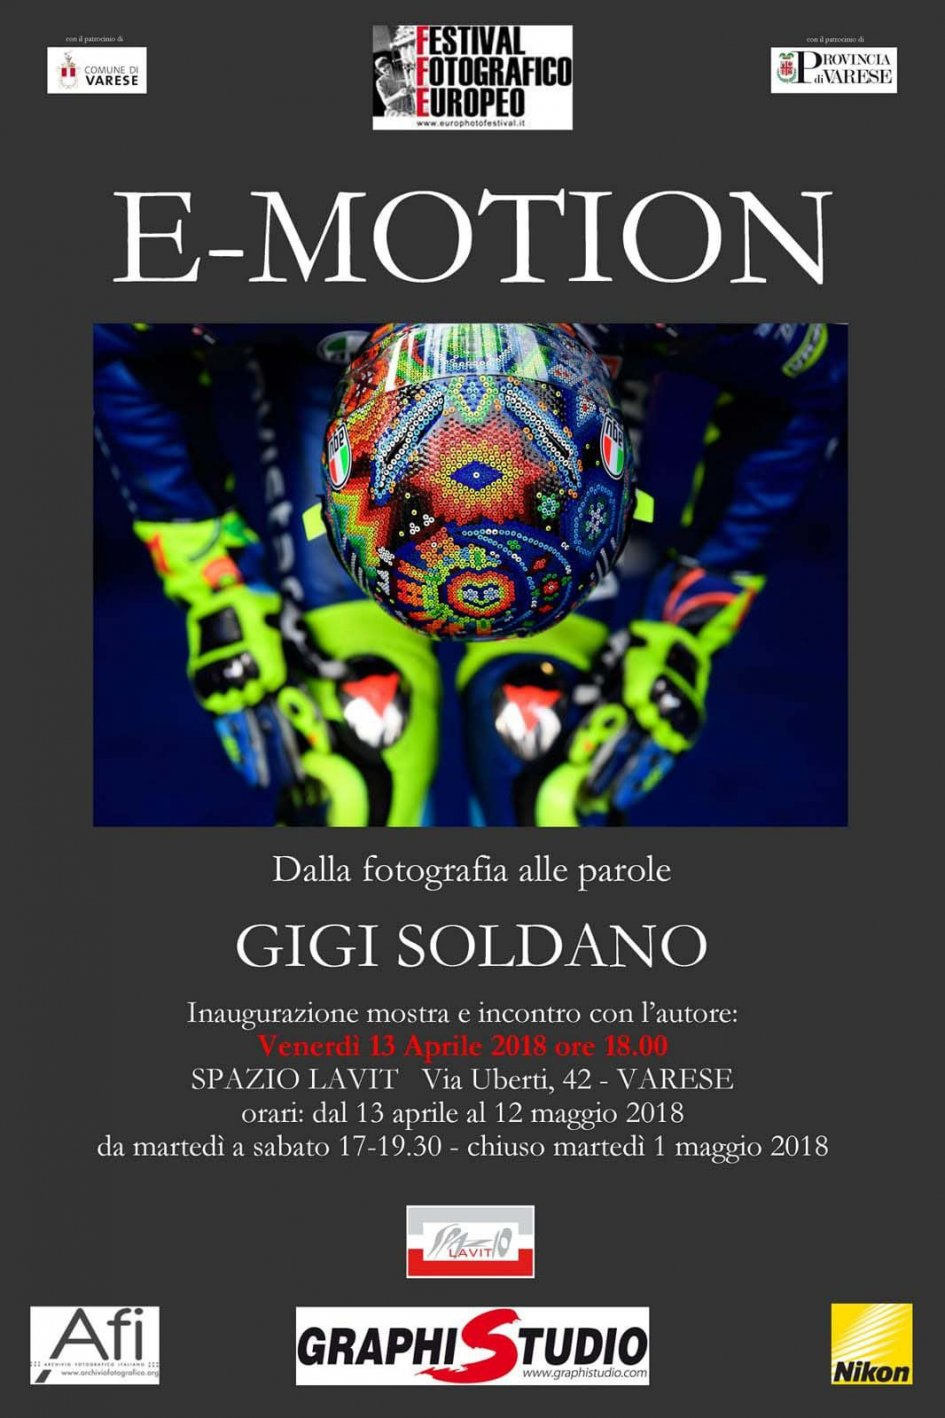 MotoGP: Gigi Soldano in mostra a Varese